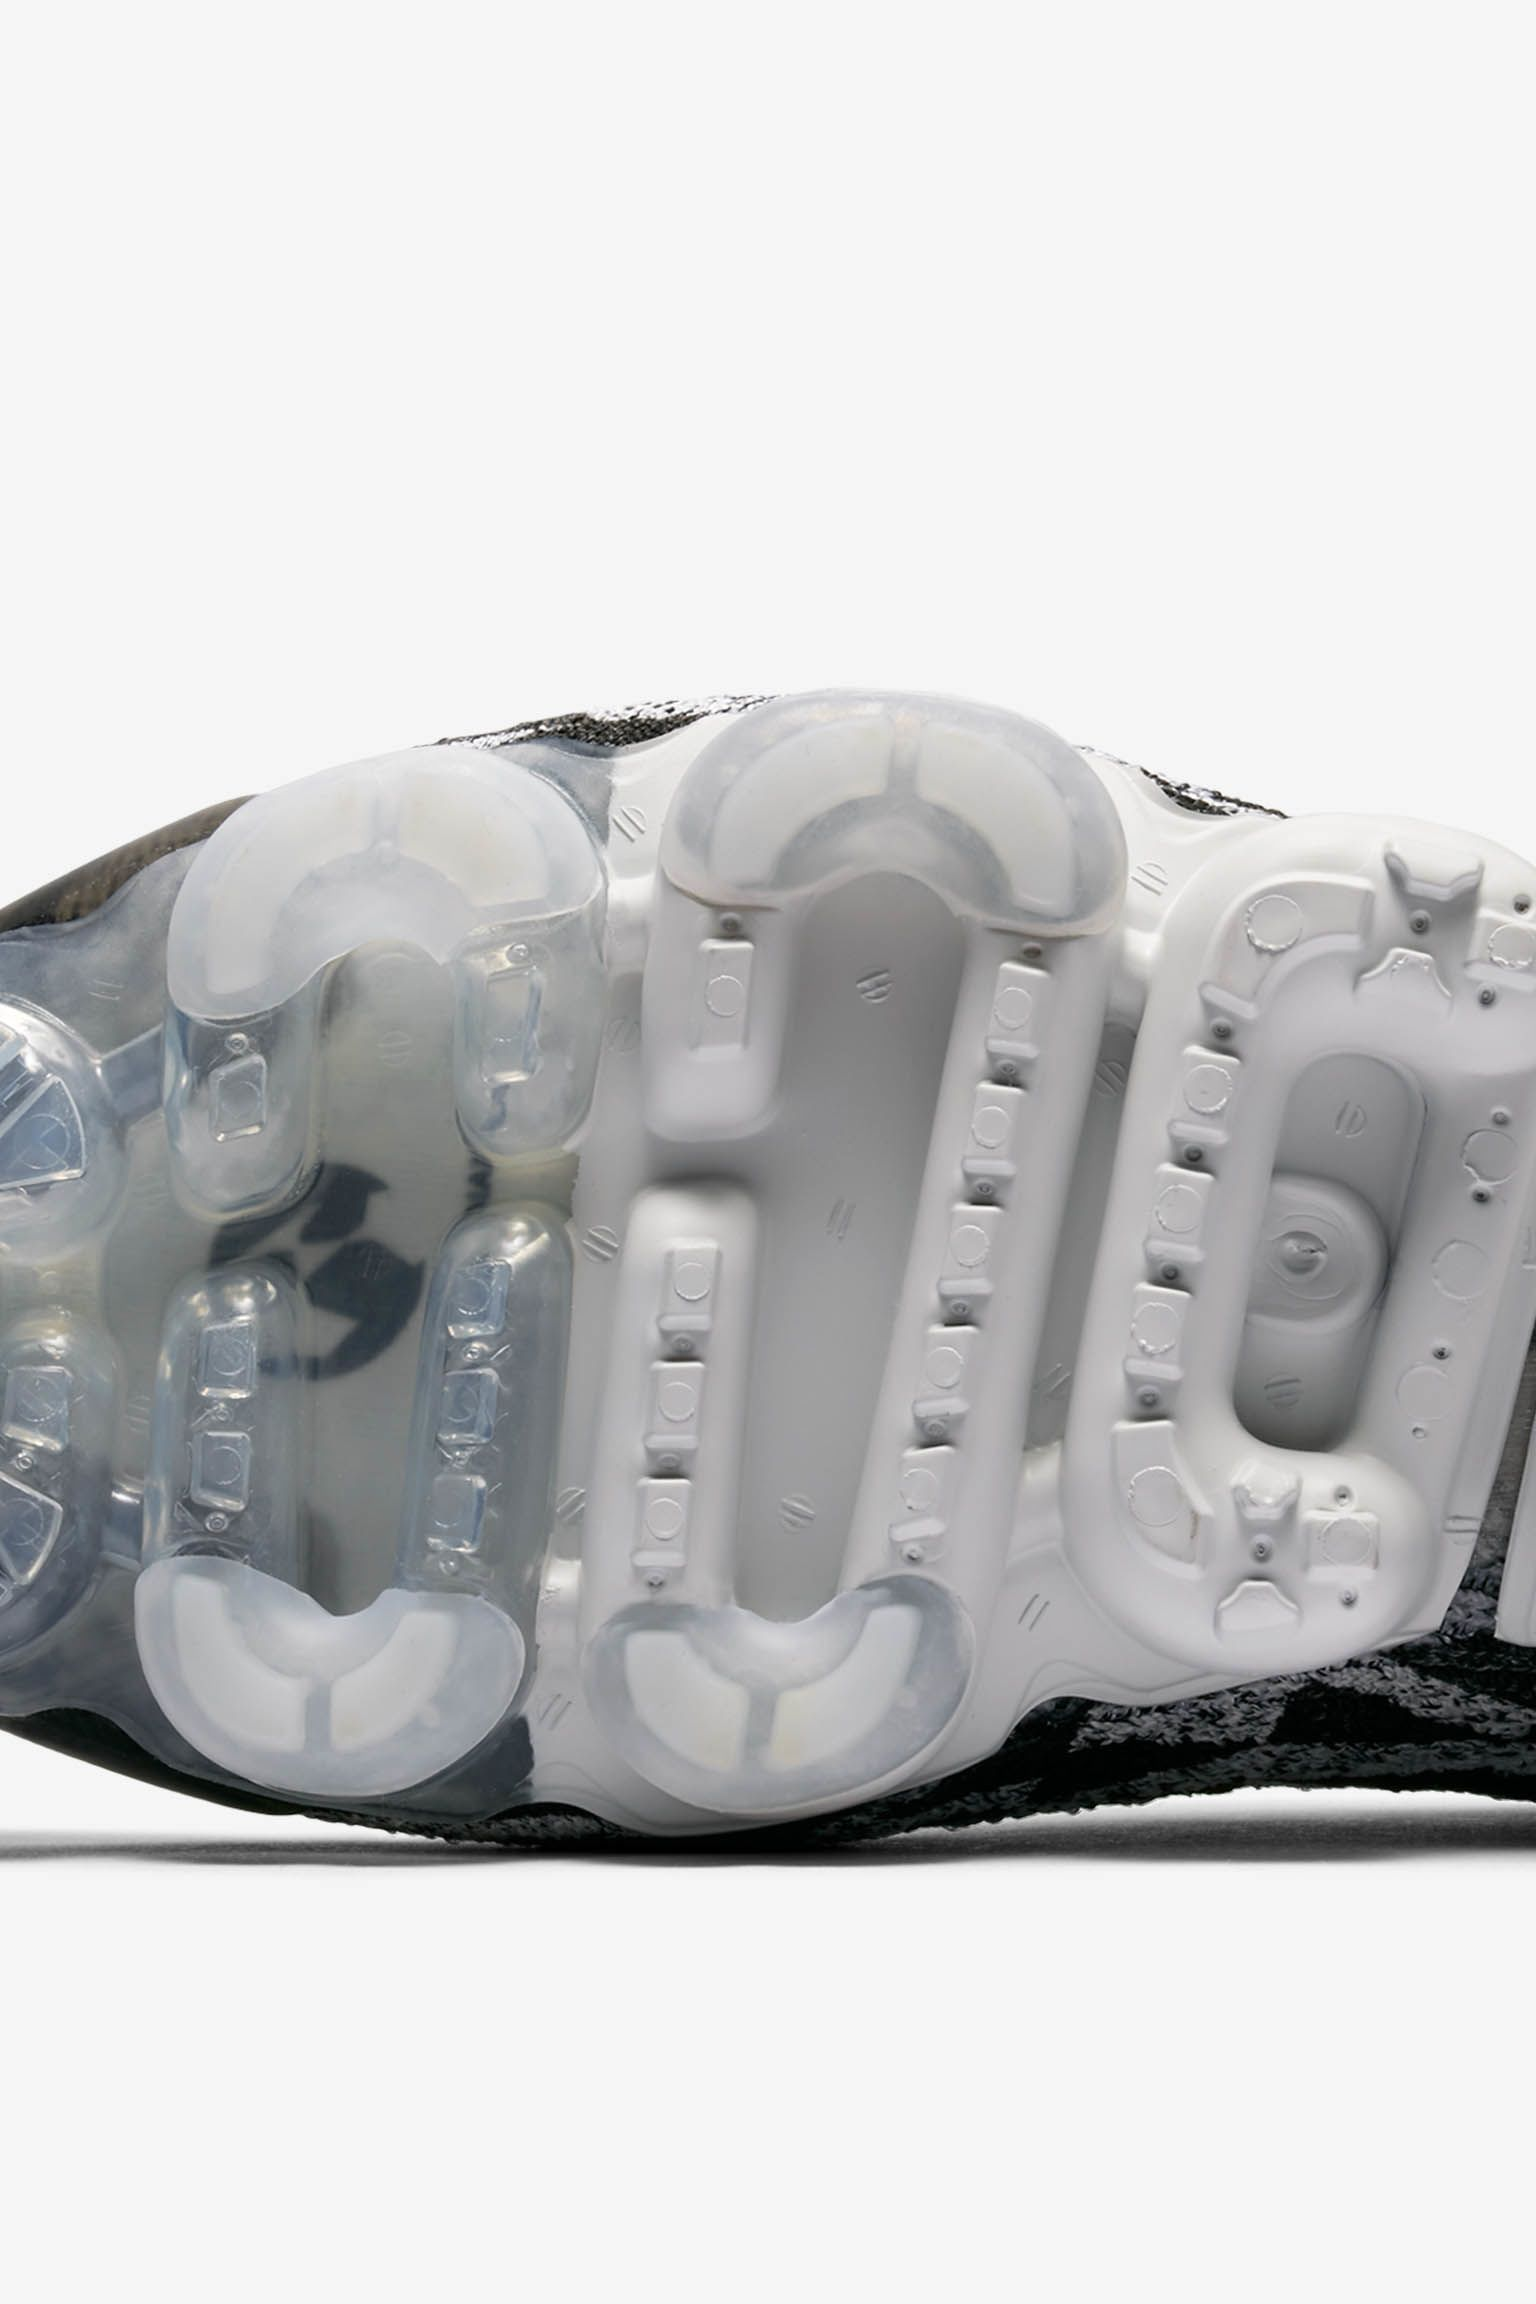 Nike Air Vapormax Moc 2 Acronym 'Light Bone & Black & Volt' Release Date